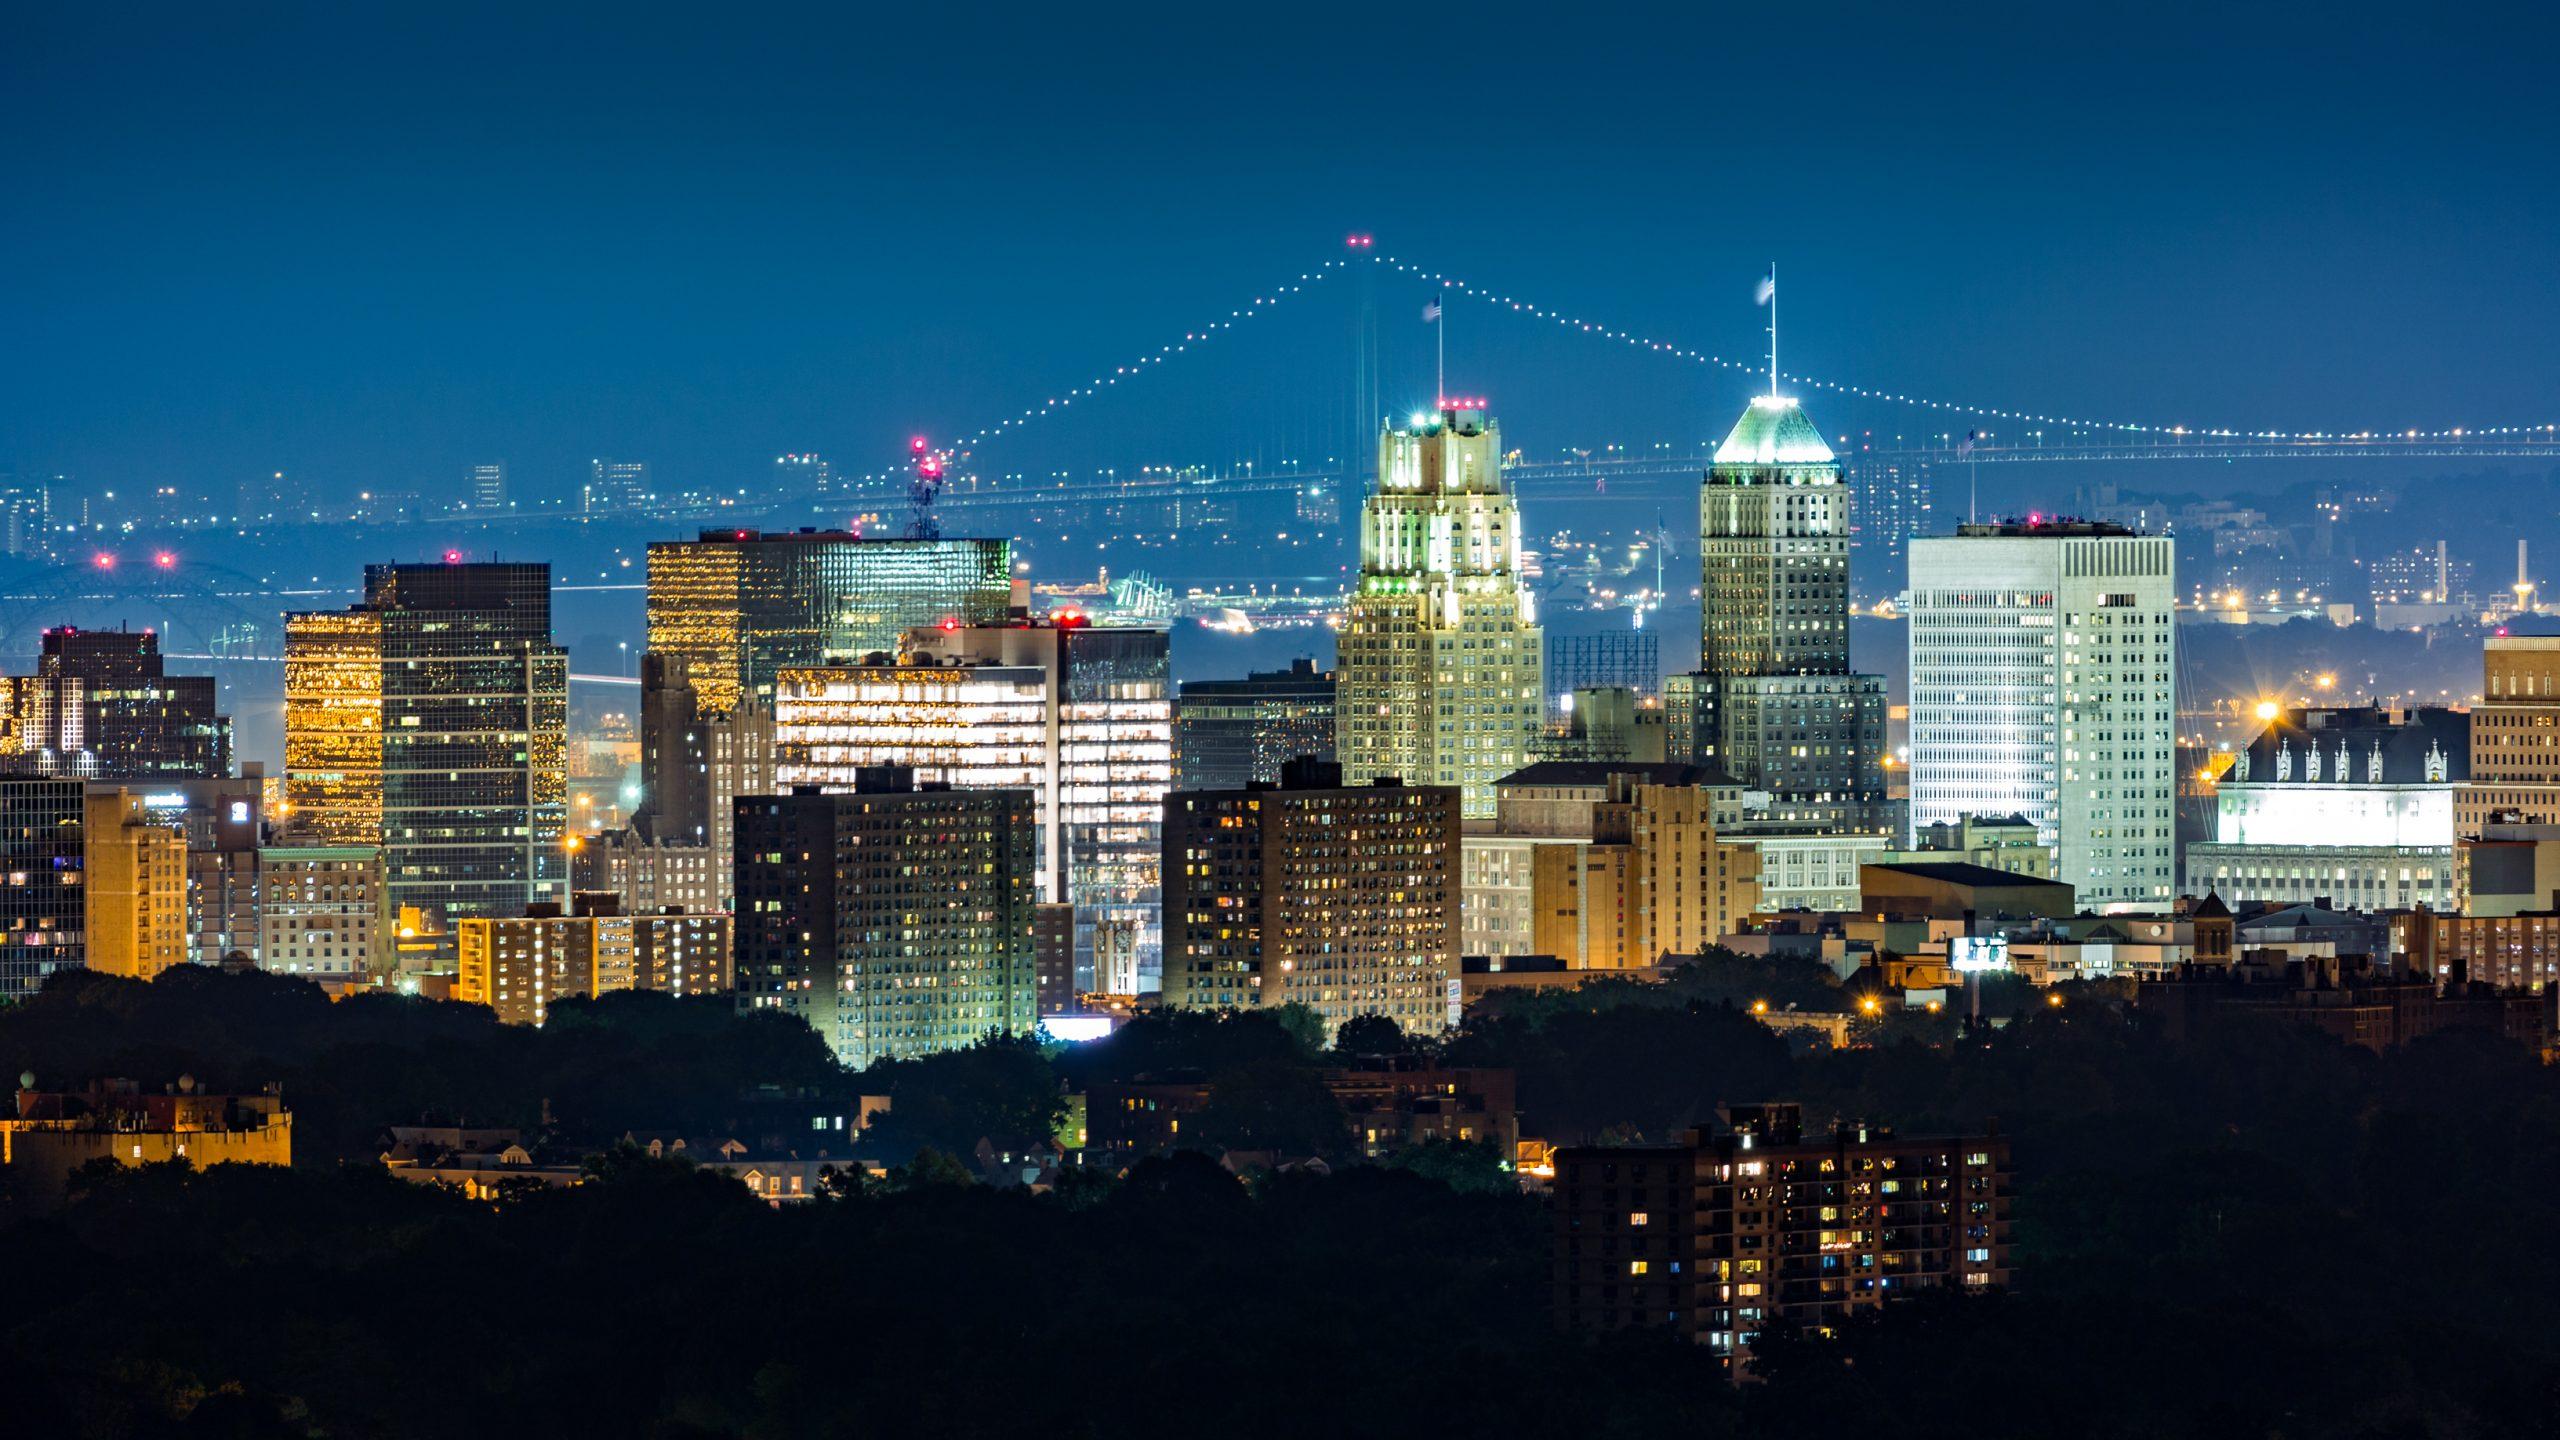 Newark, NJ, skyline on a hazy night with Verrazano Narrows bridge in the background.